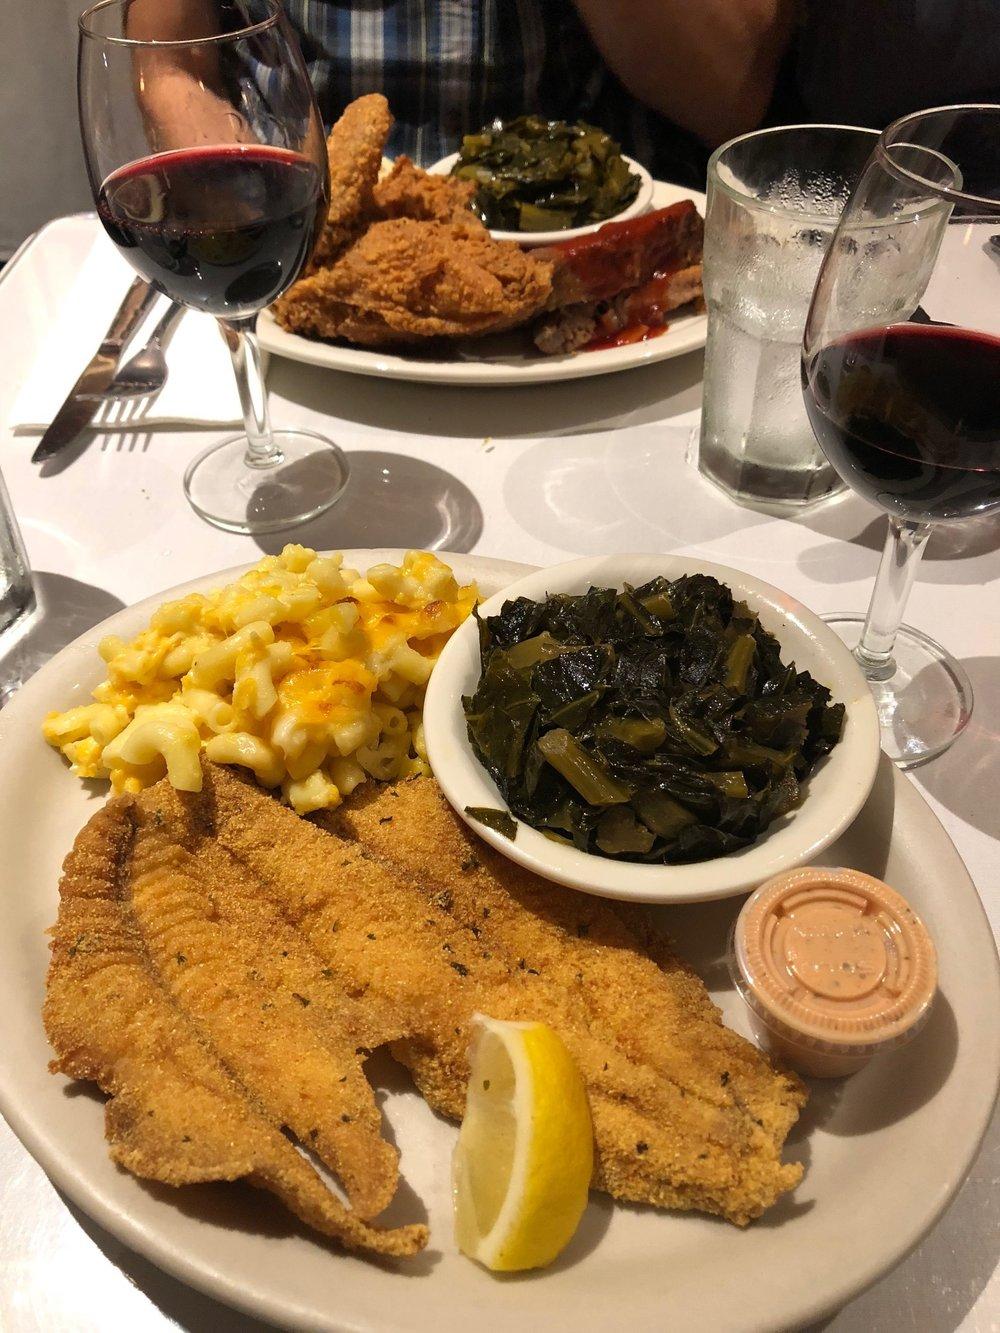 Soul food | fried catfish, collard greens, mac n cheese.